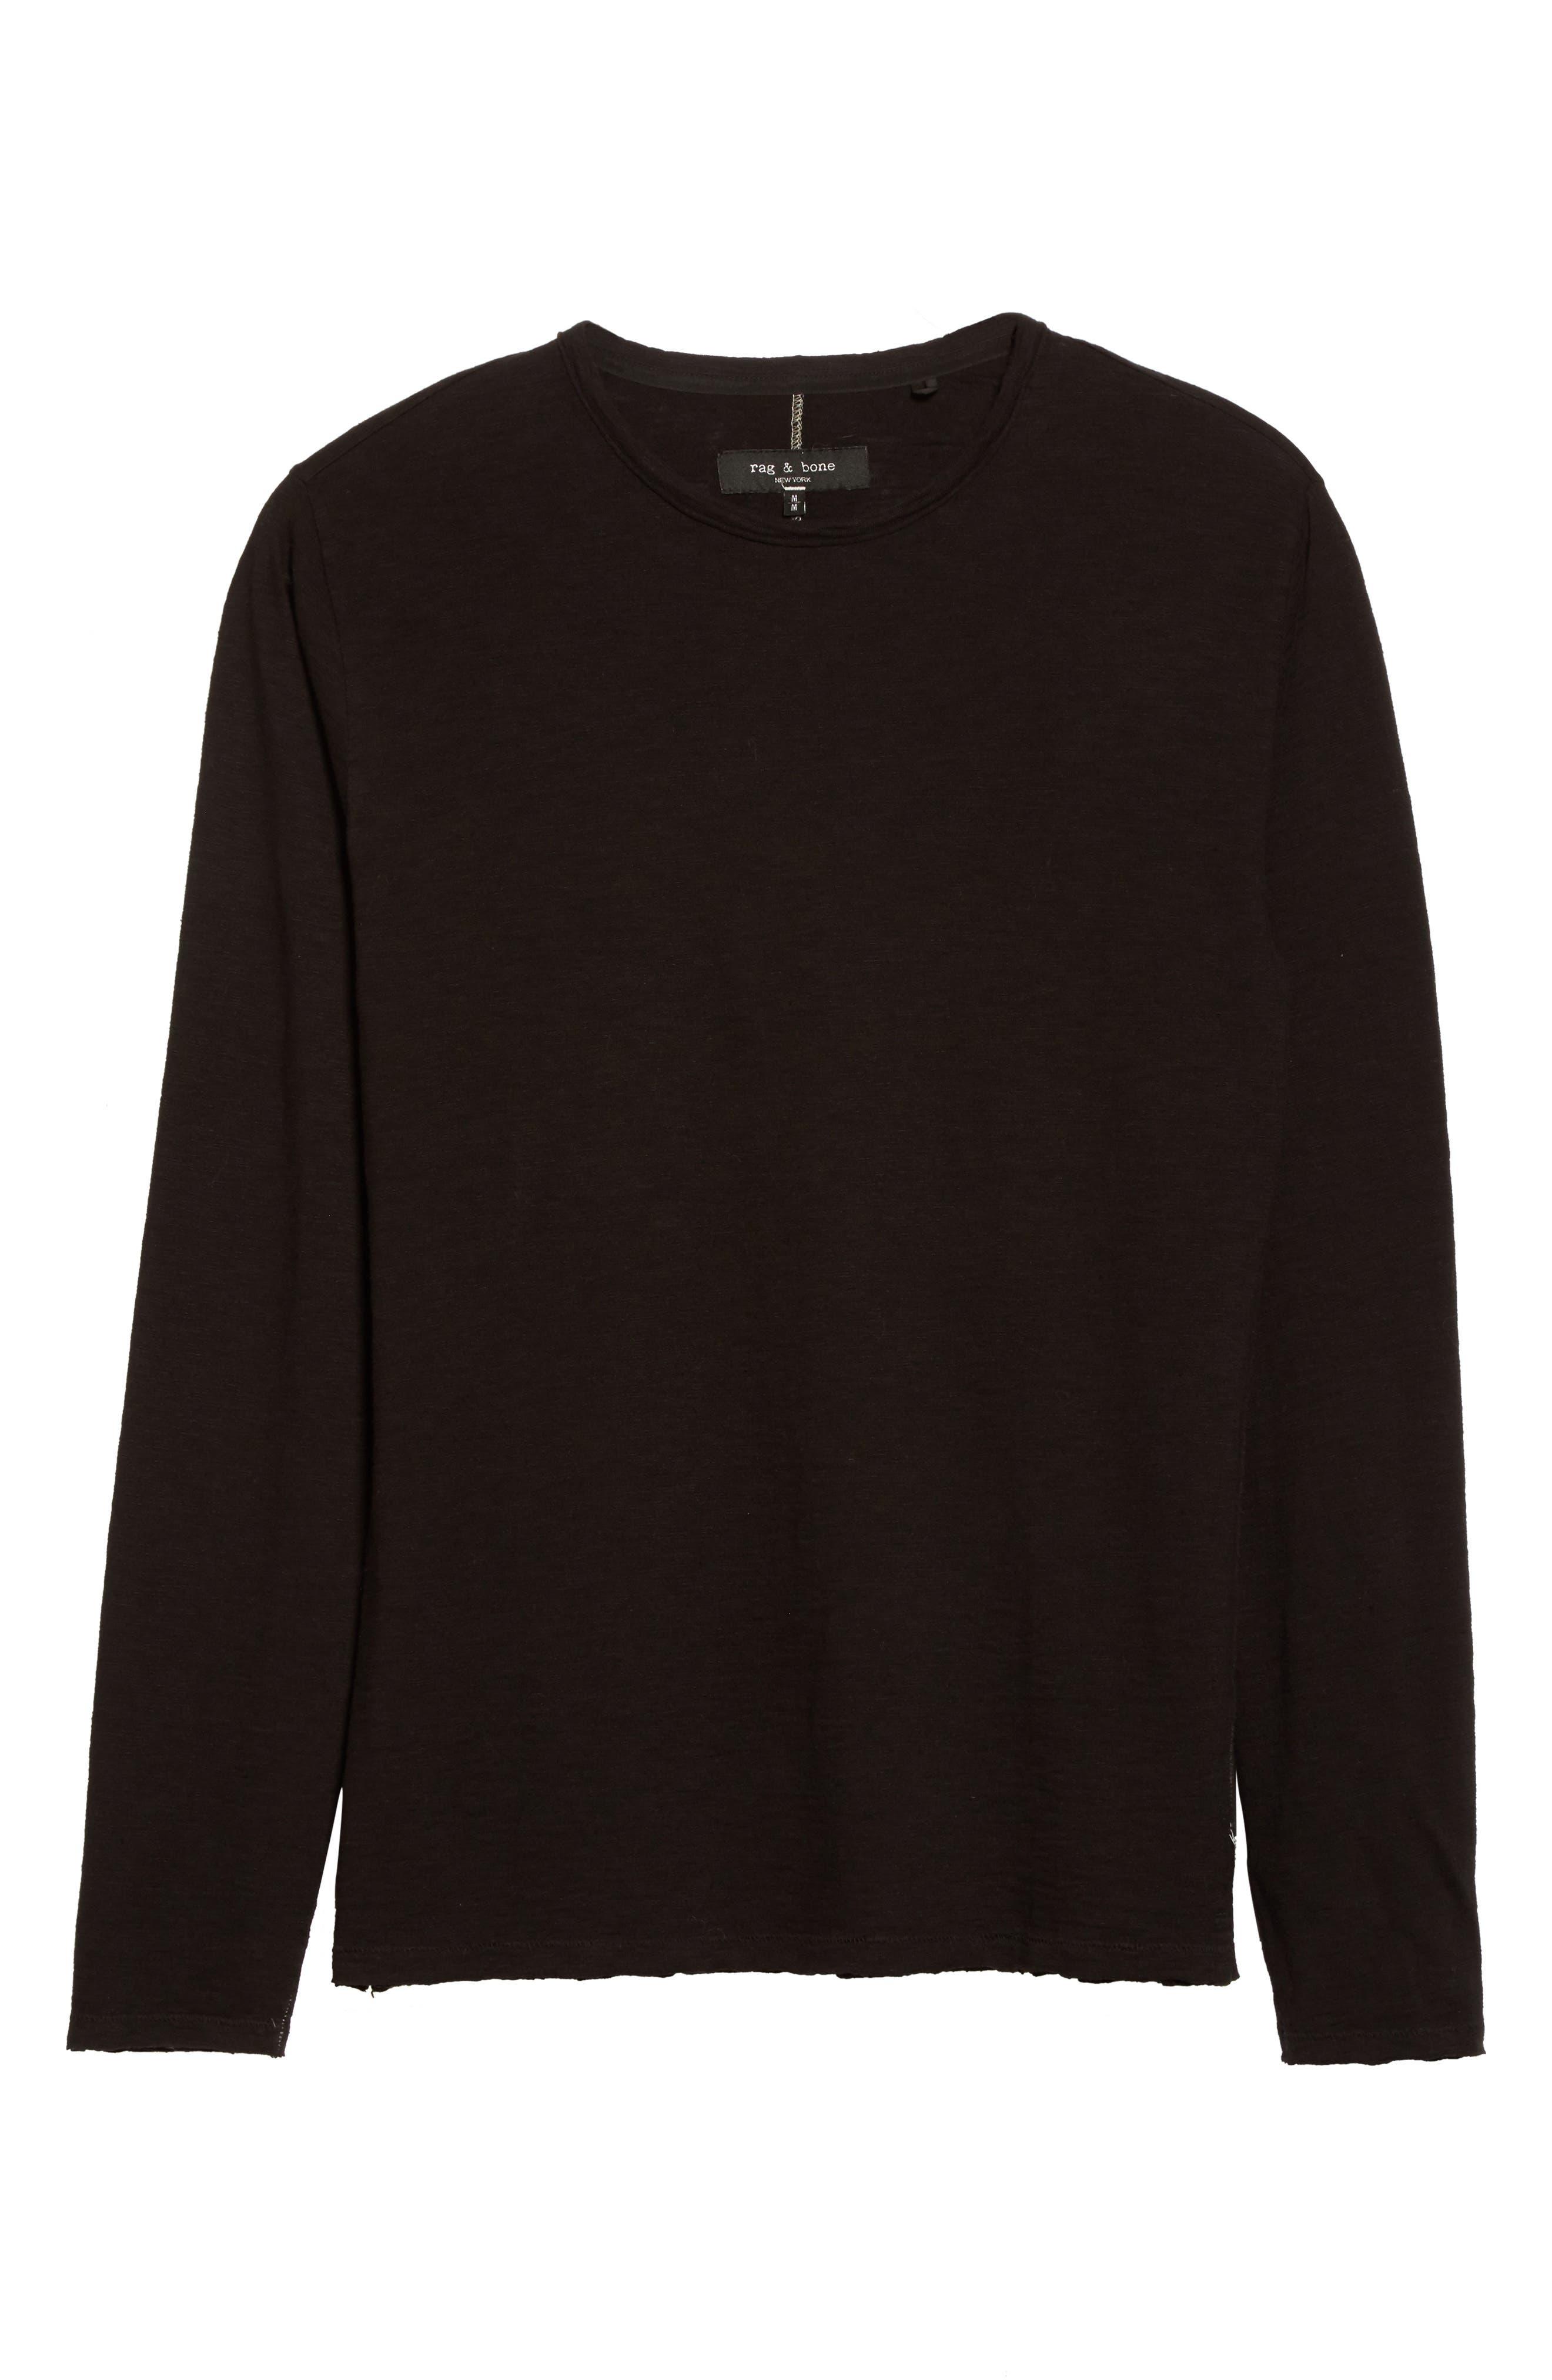 Owen T-Shirt,                             Alternate thumbnail 8, color,                             Black